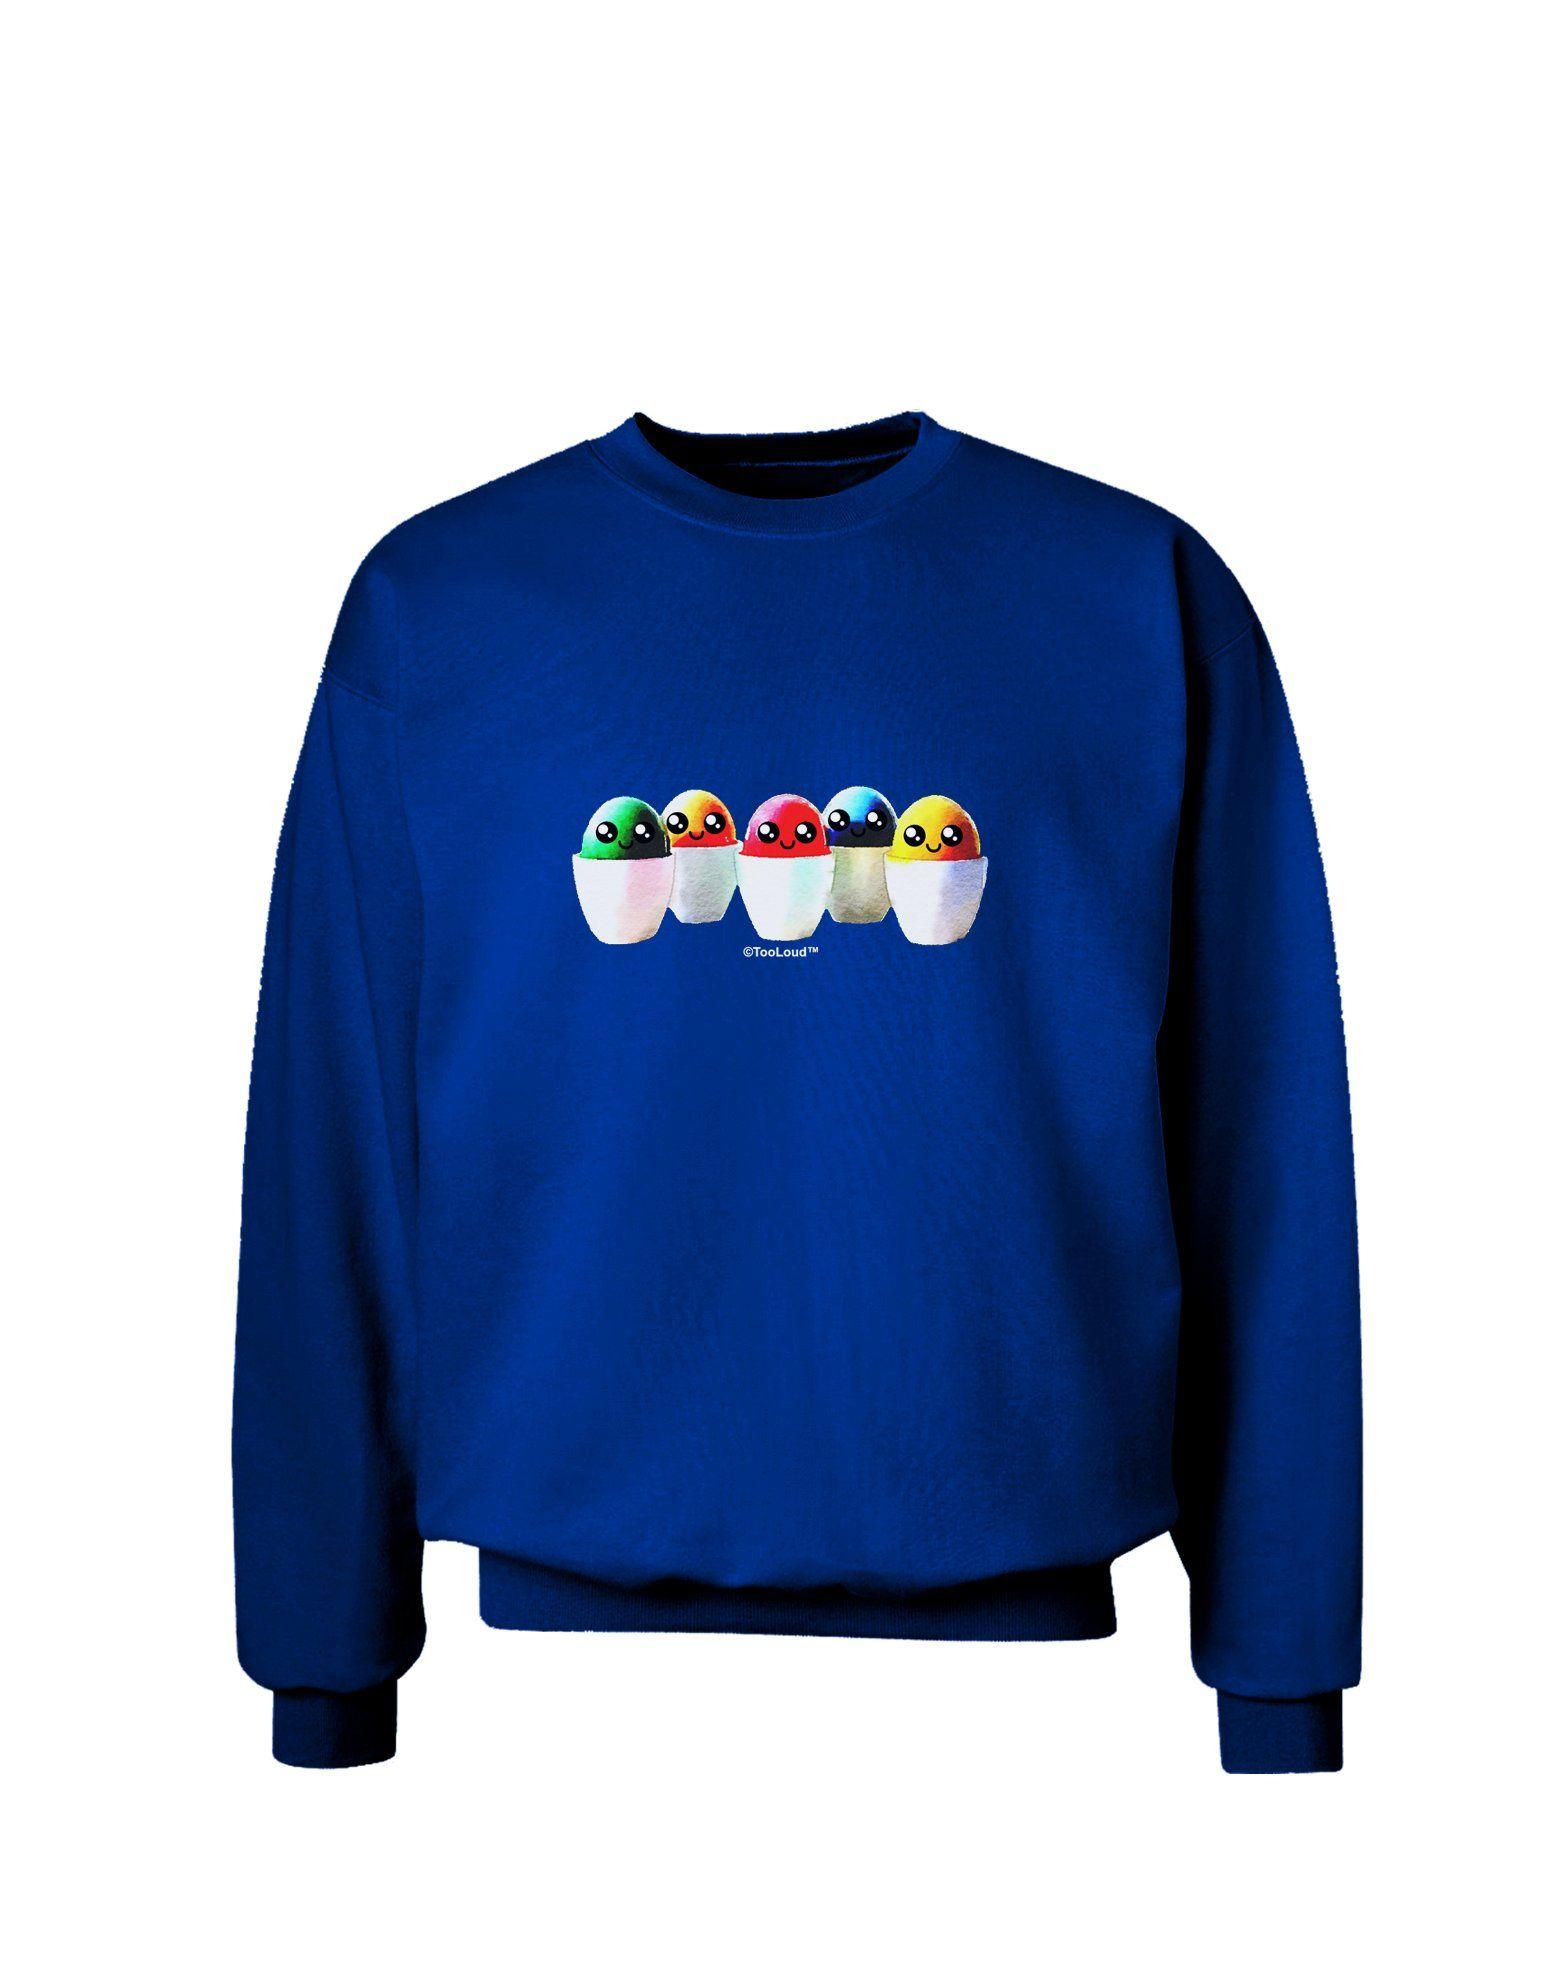 Kawaii Easter Eggs - No Text Adult Dark Sweatshirt by TooLoud